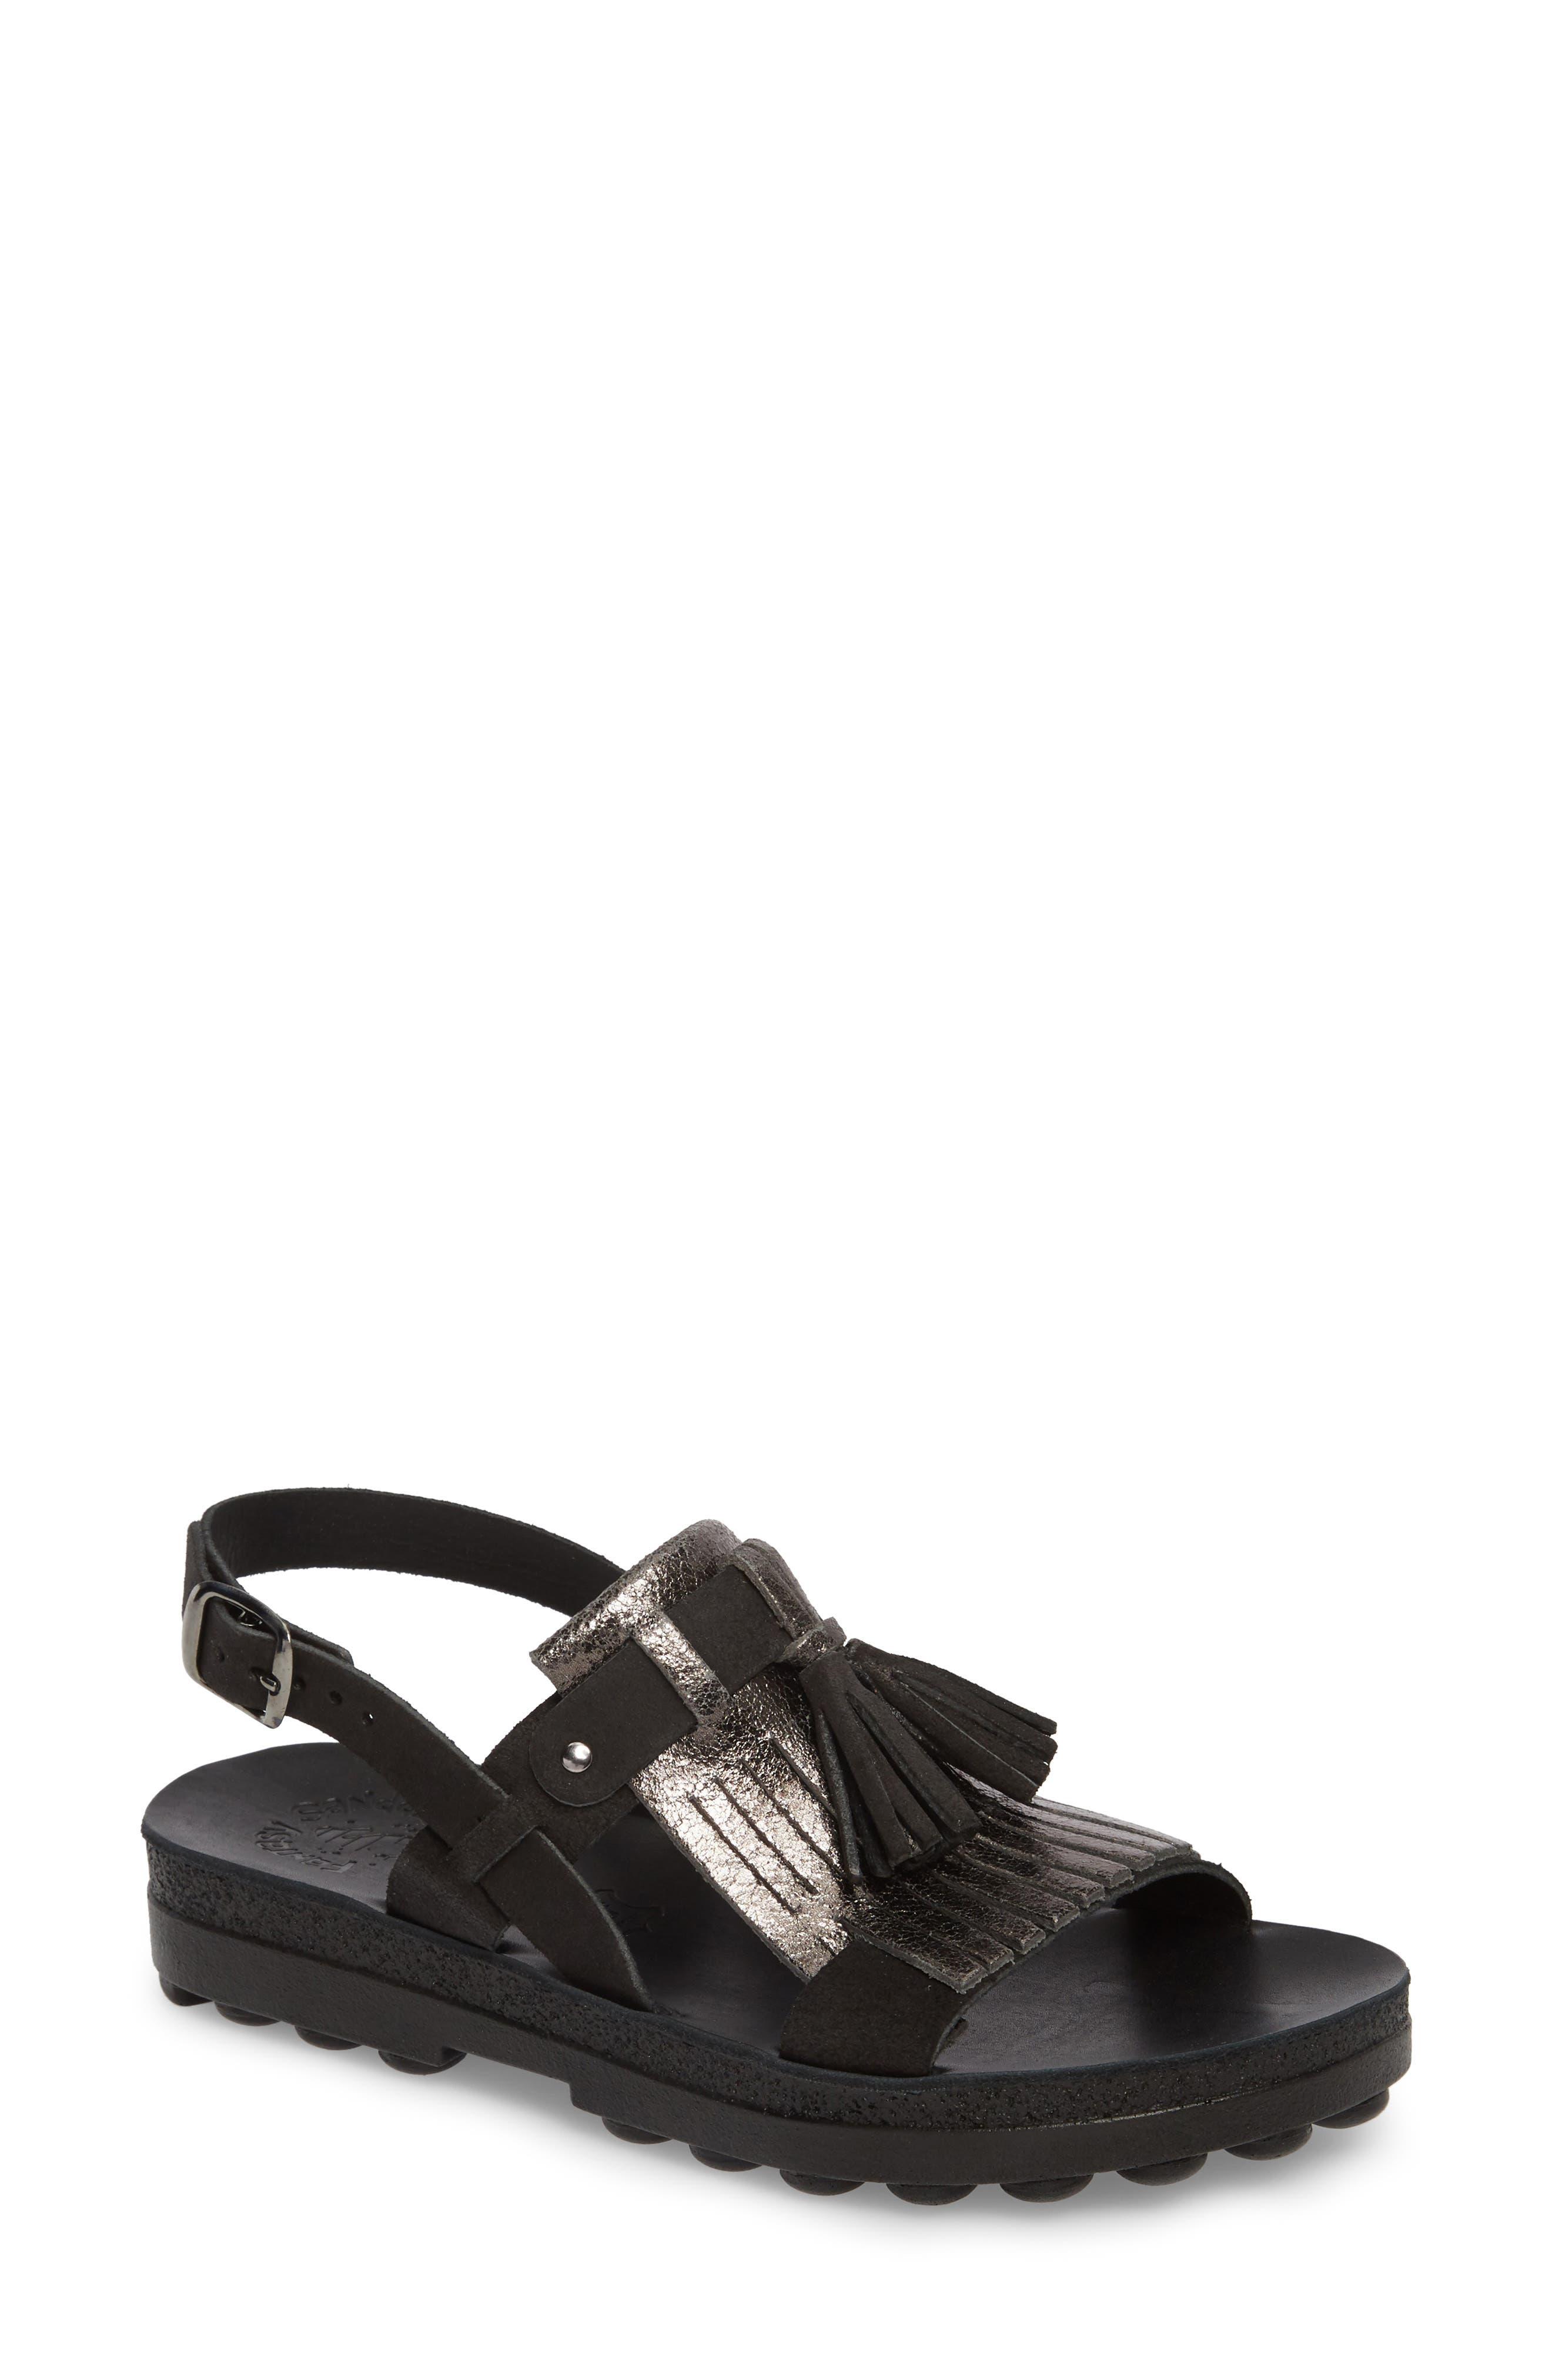 Anna Sandal,                         Main,                         color, Black Glitter Leather